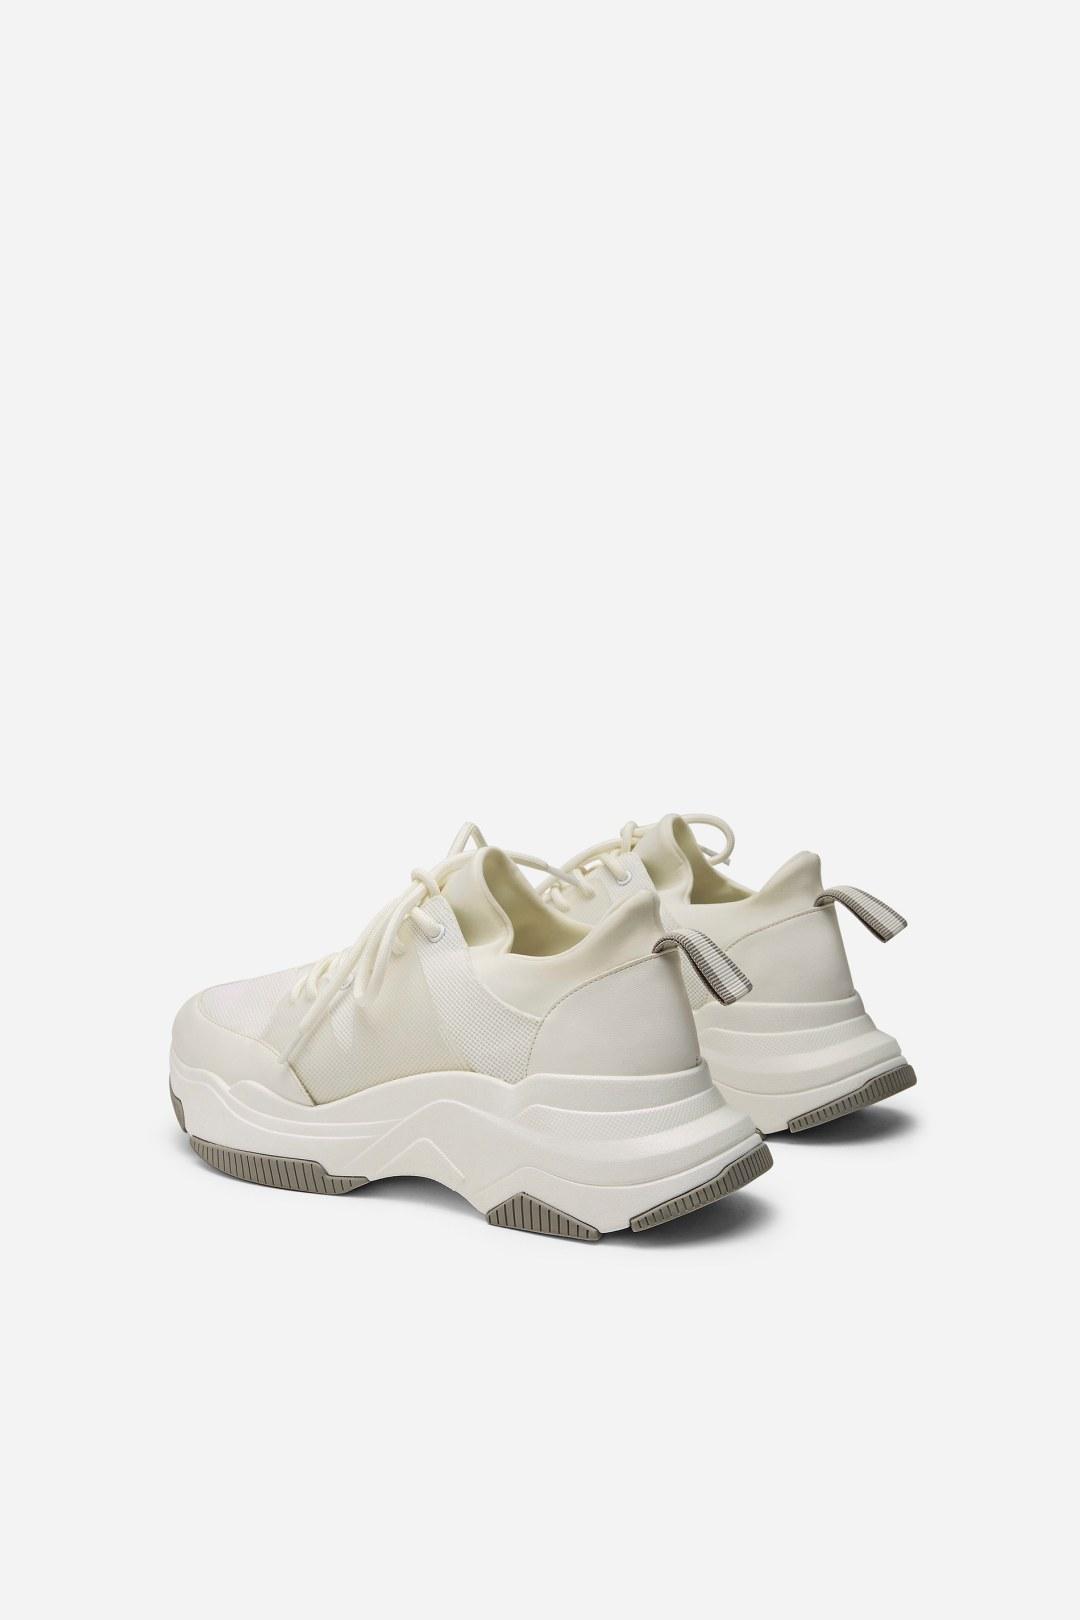 Charles keith小厚底系带运动鞋小CK1-71700039-小ck中文网